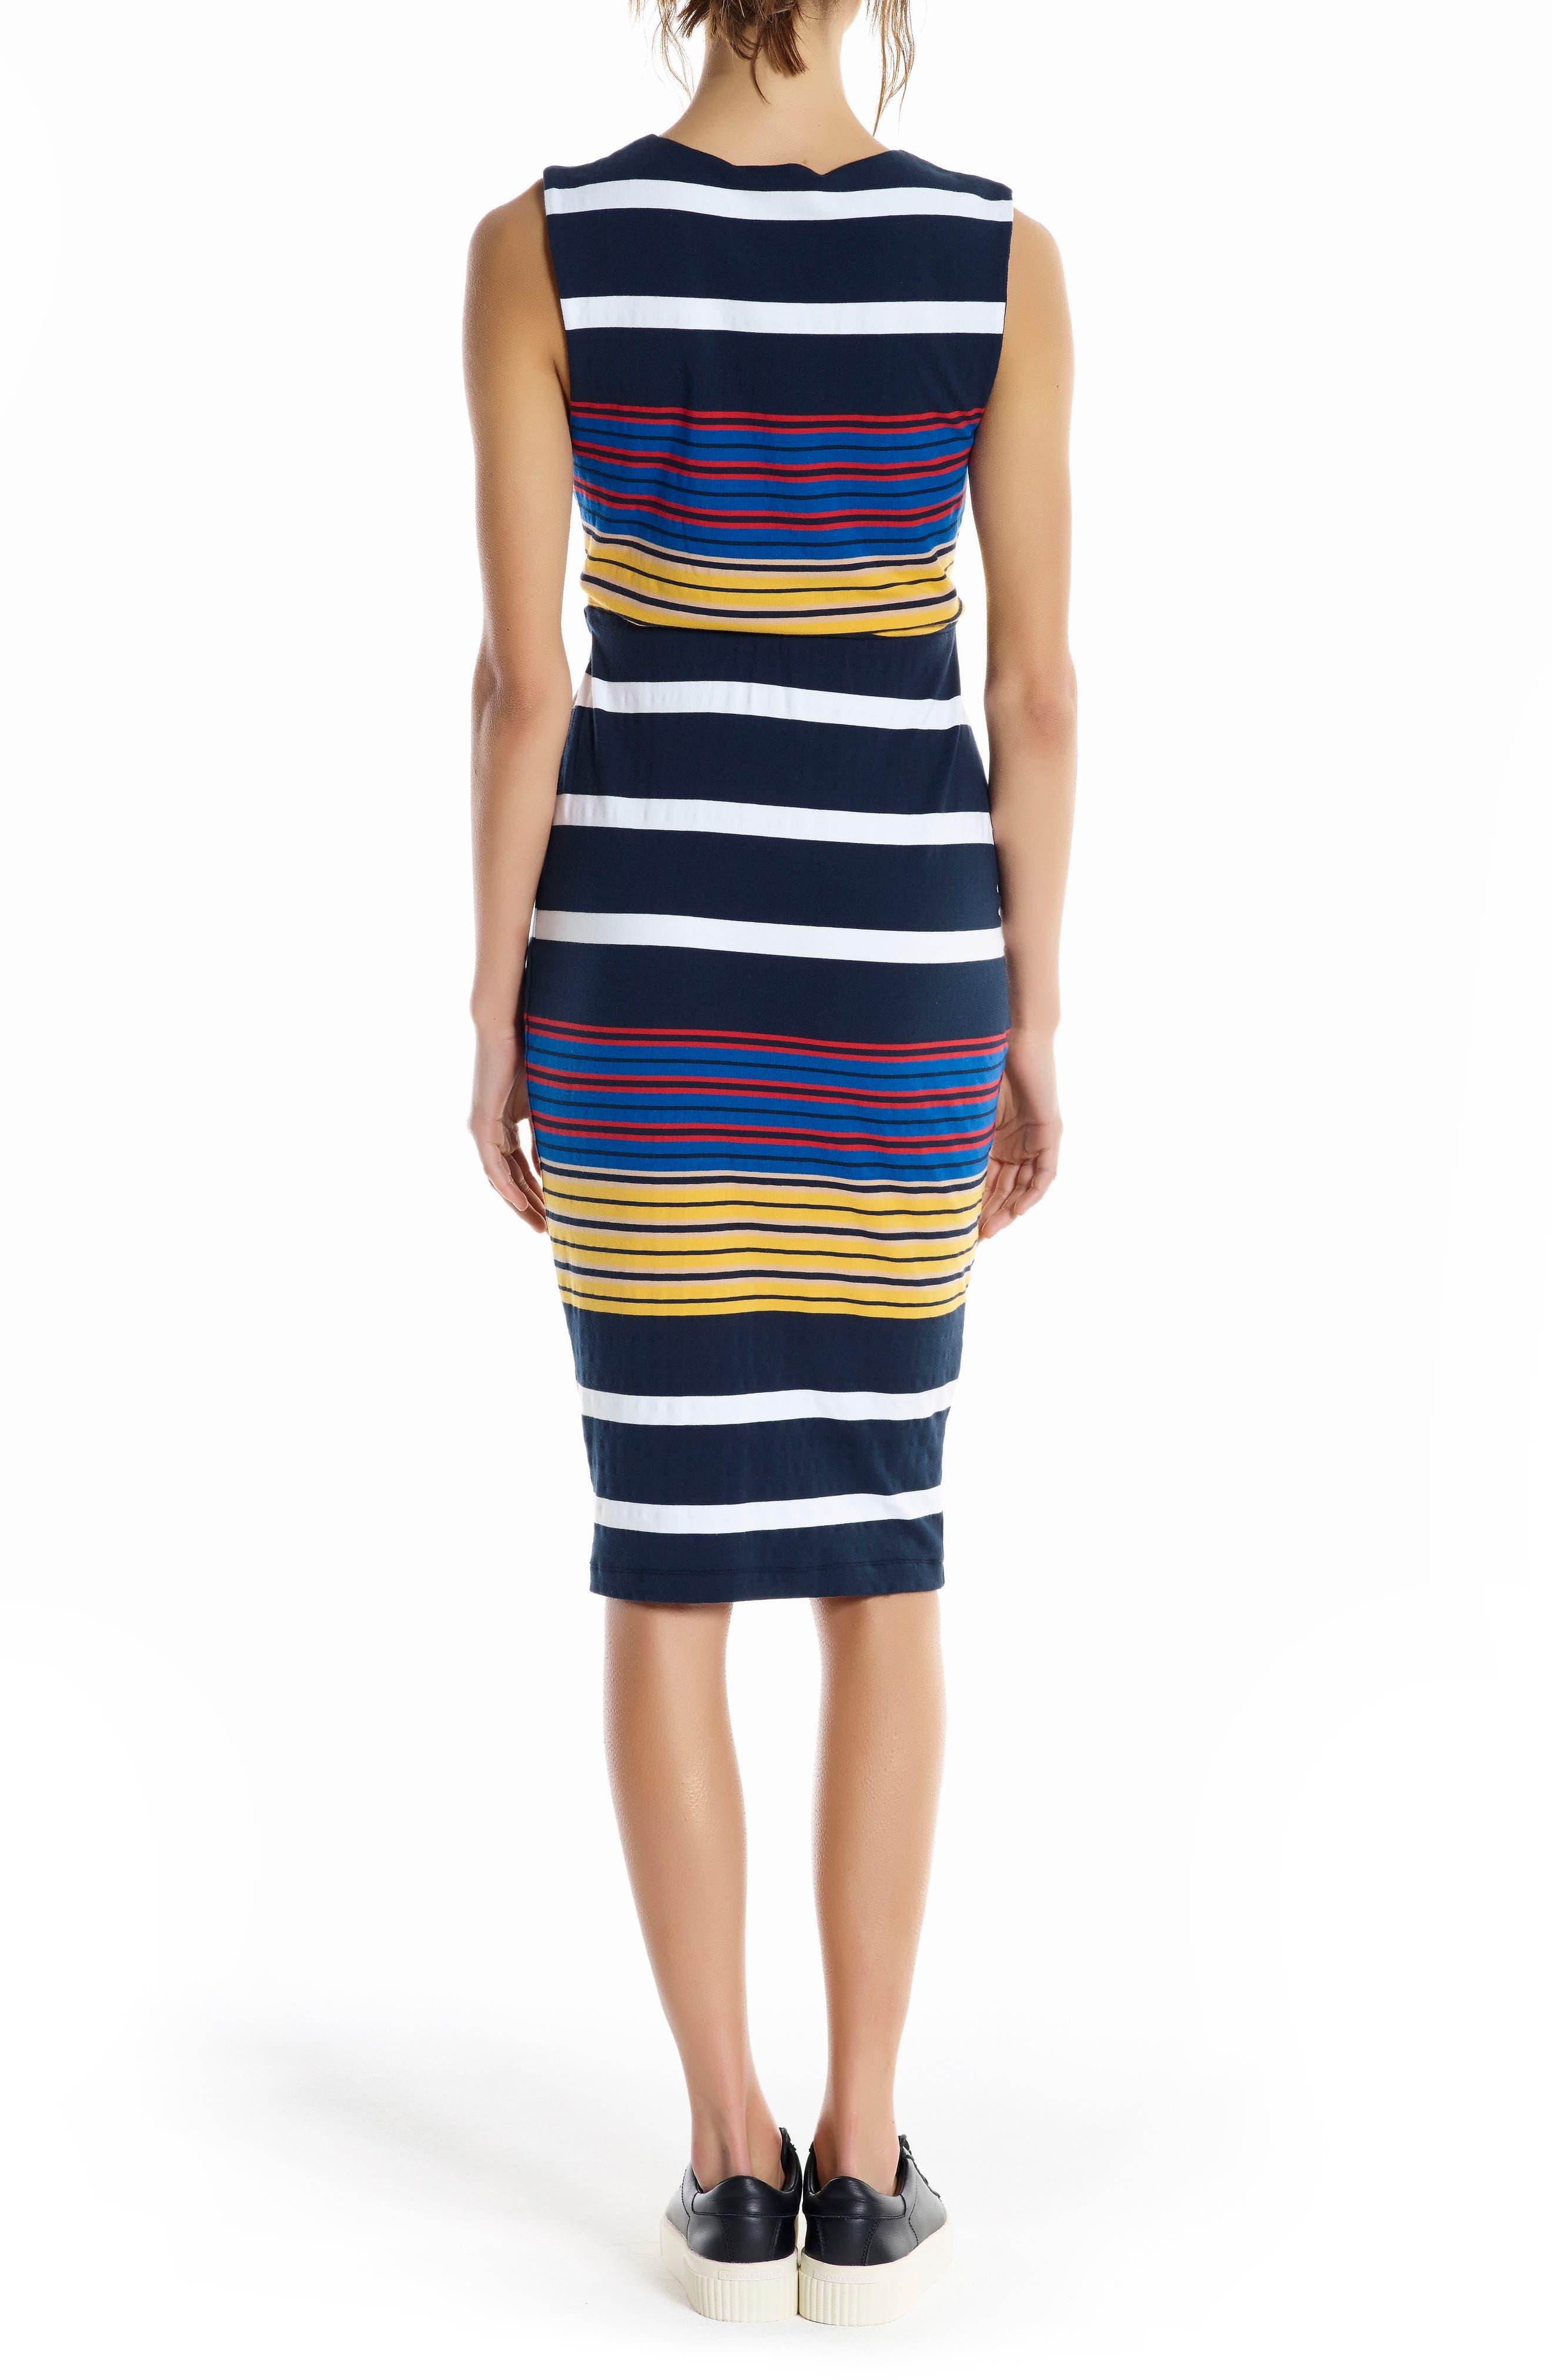 KENDELL + KYLIE Stripe Midi Dress,                             Alternate thumbnail 2, color,                             001